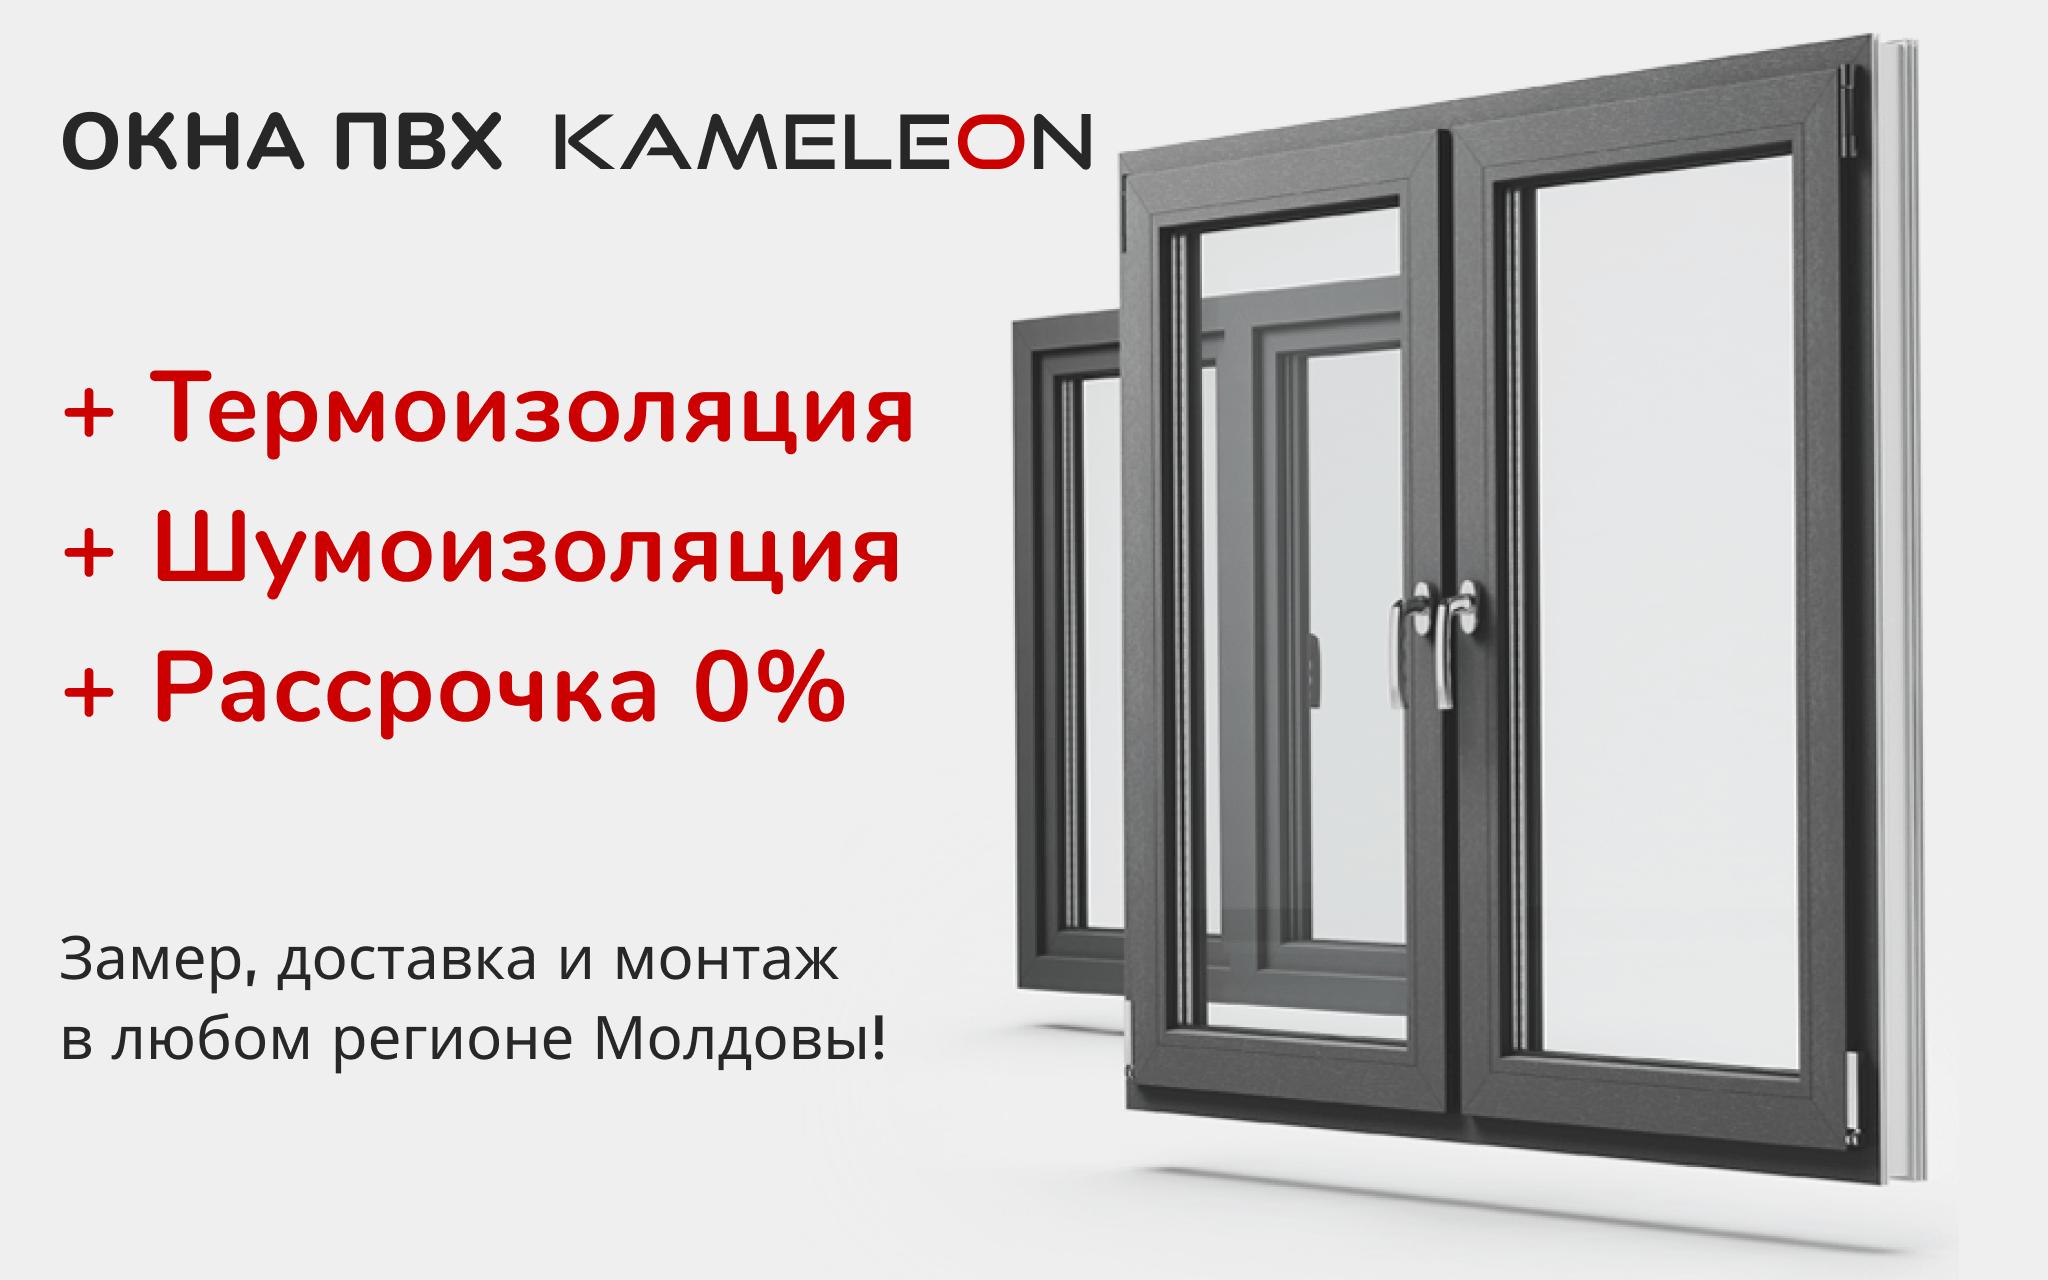 Окна Стеклопакет Кишинев